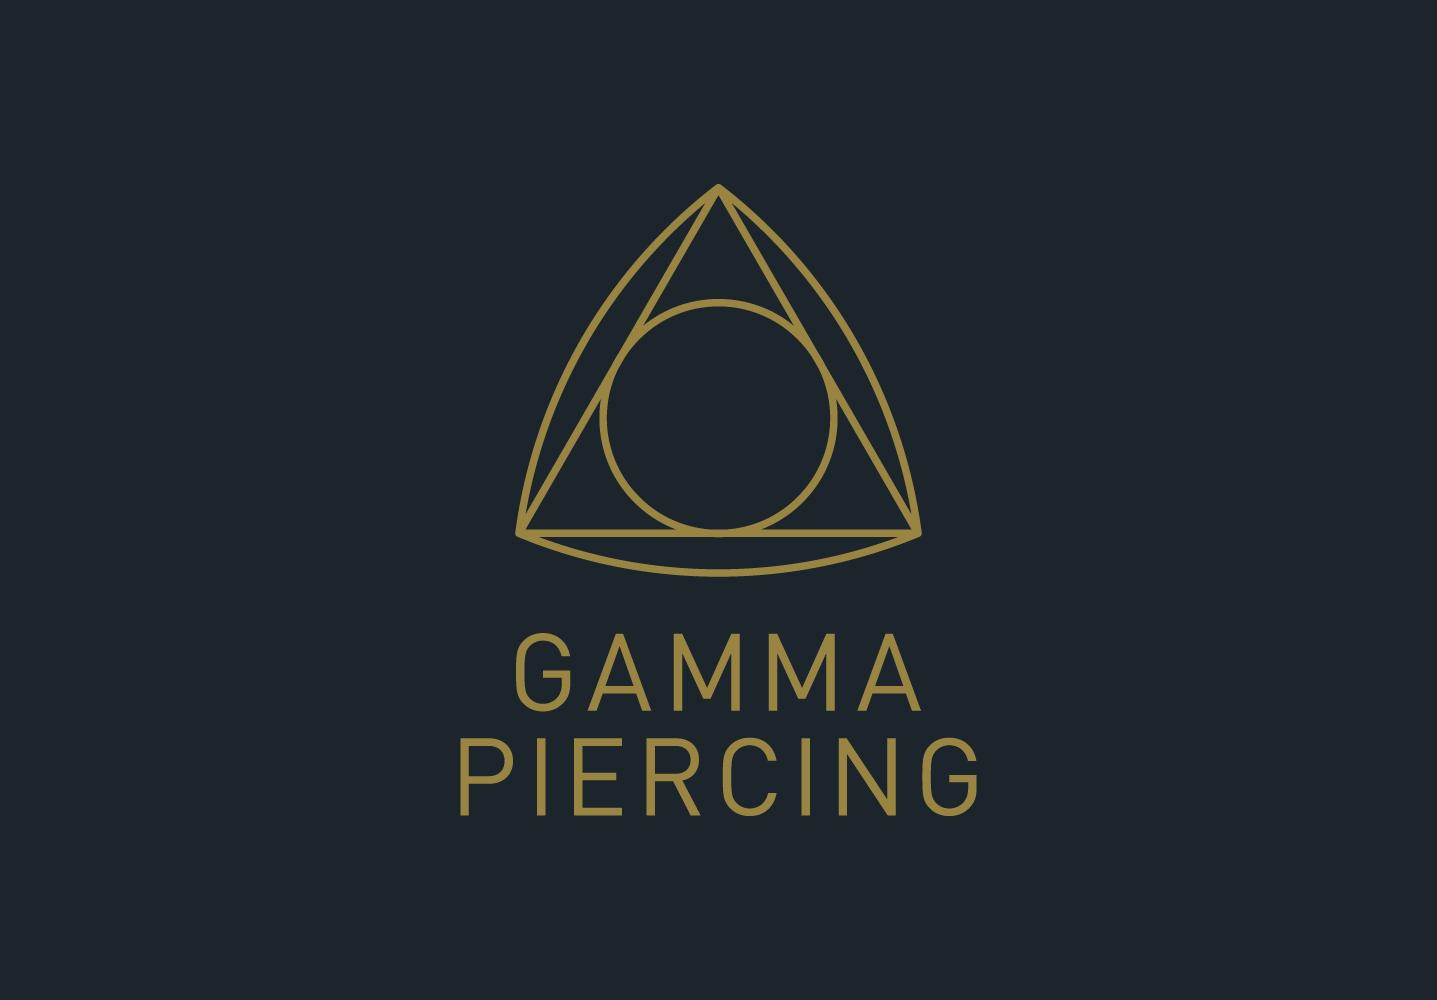 gammapiercing_color.png